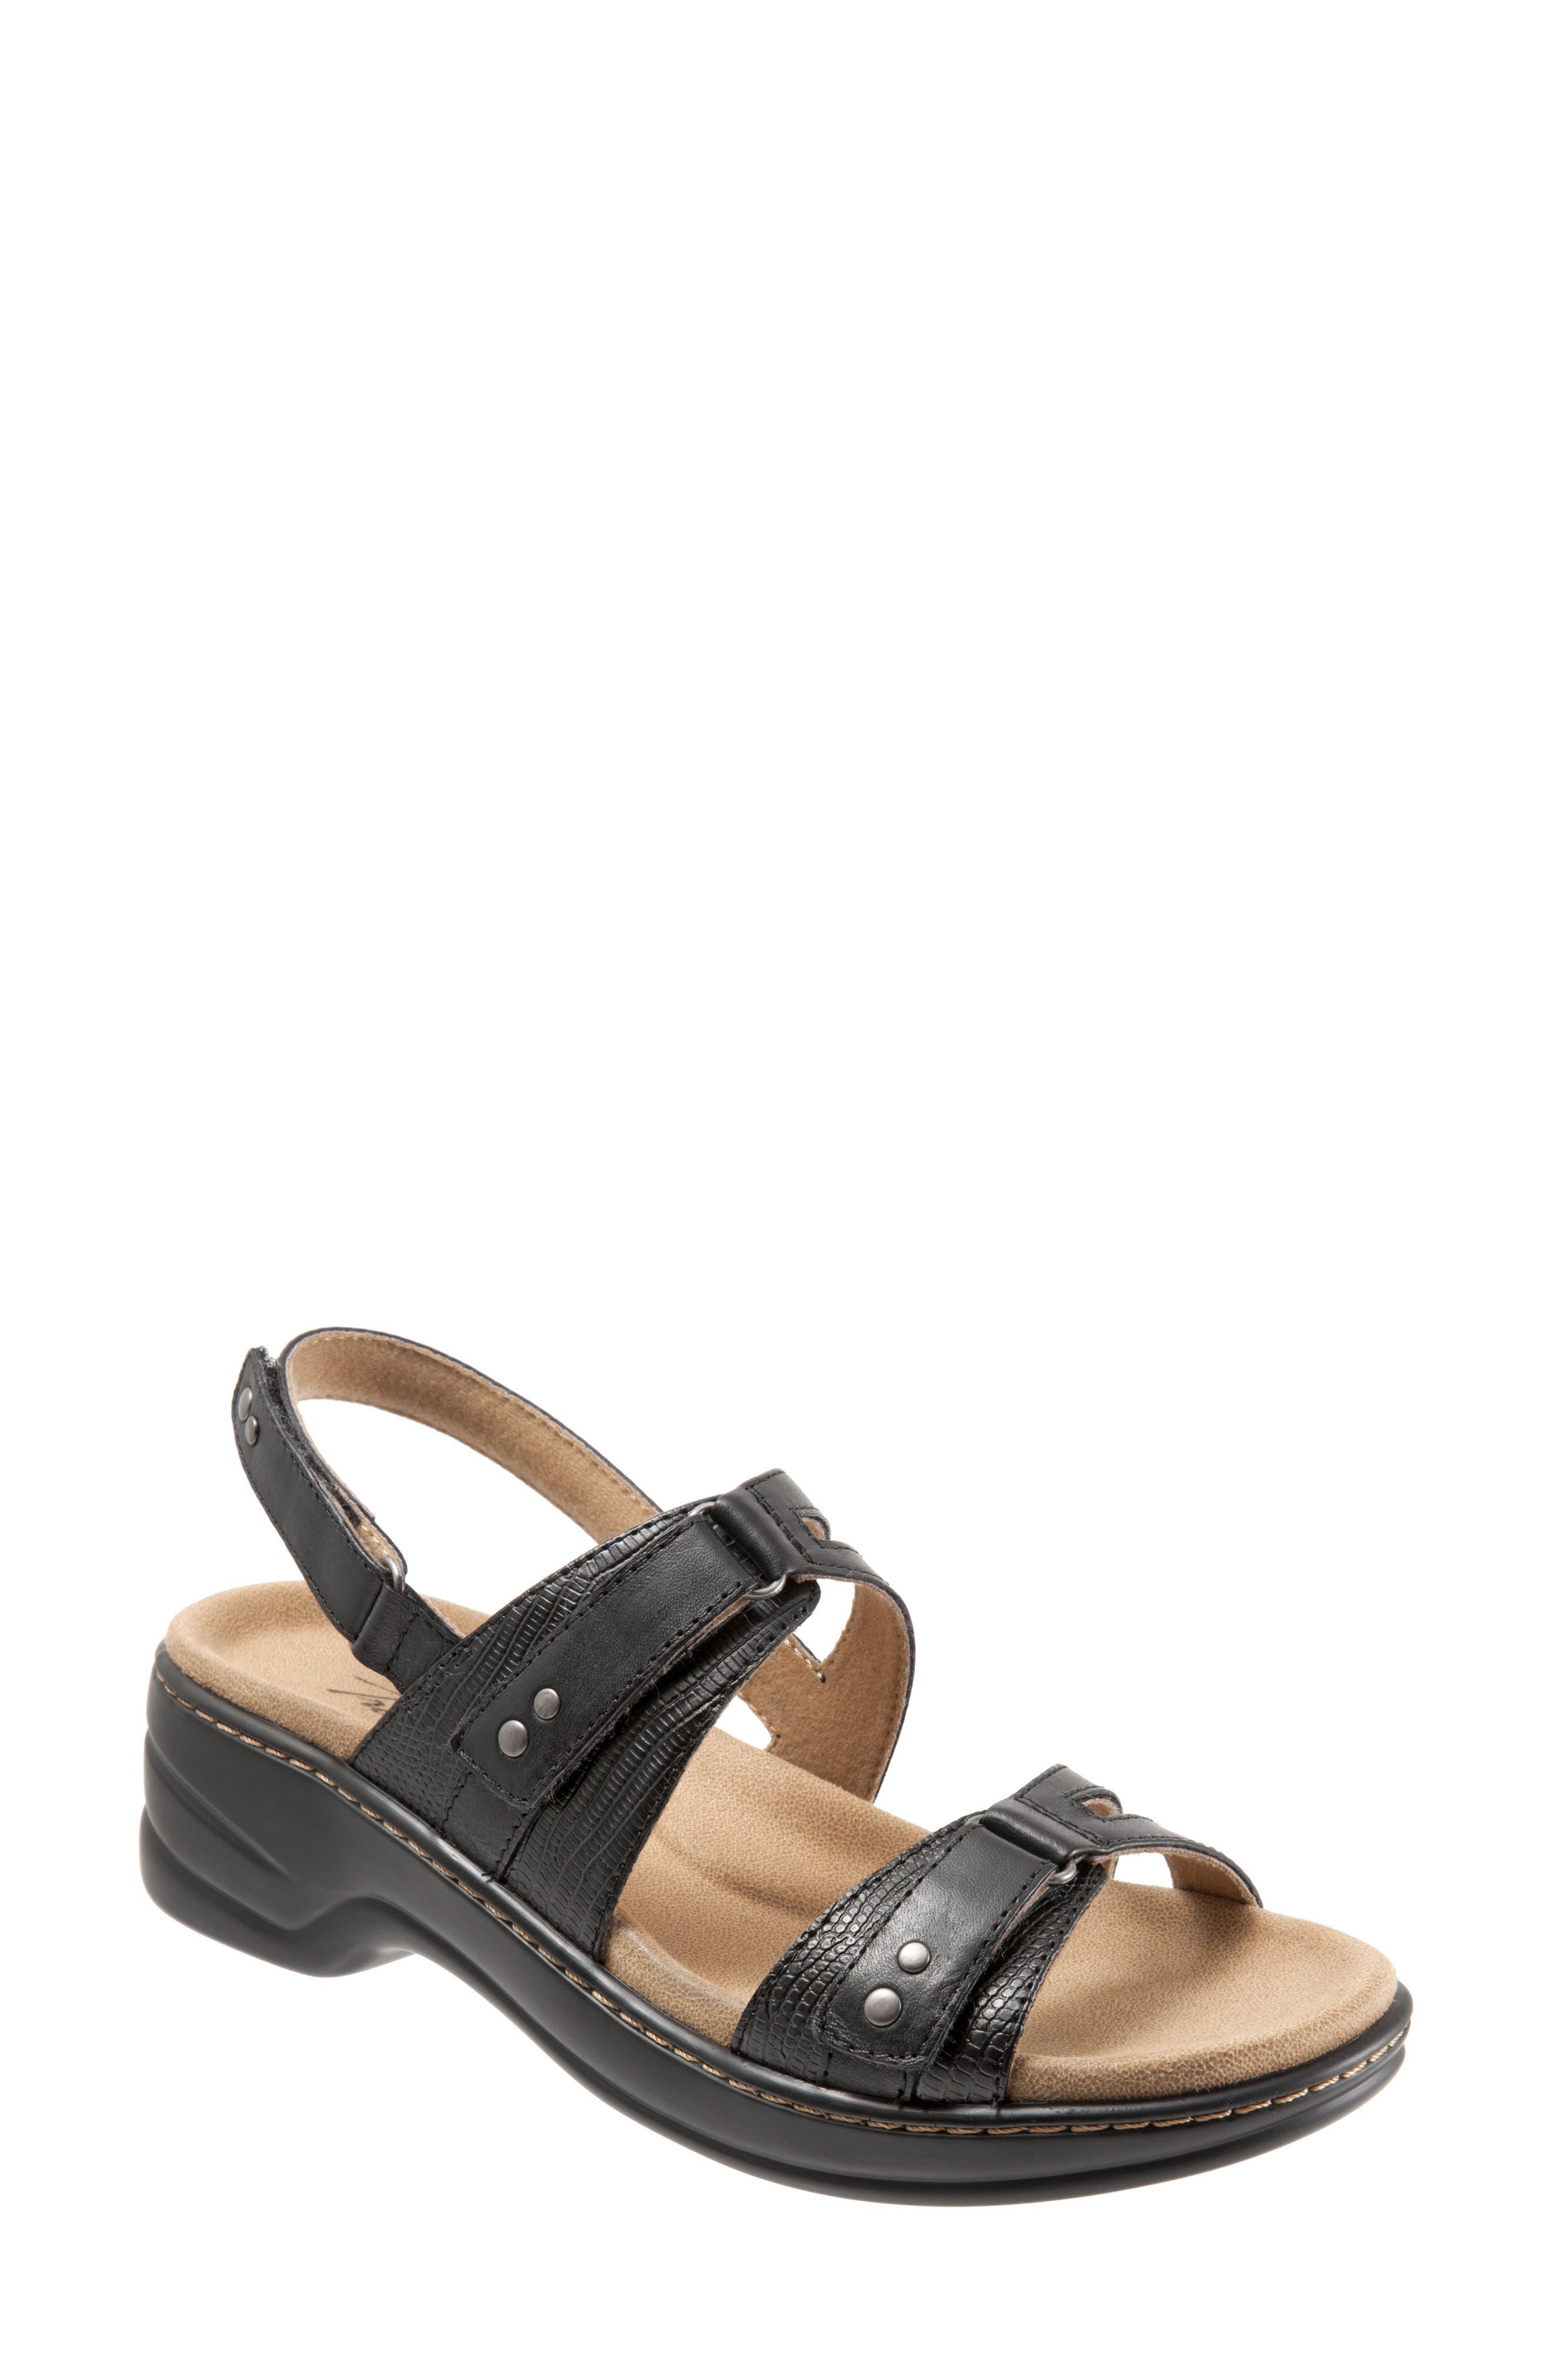 Newton Sandal,                         Main,                         color, BLACK LEATHER